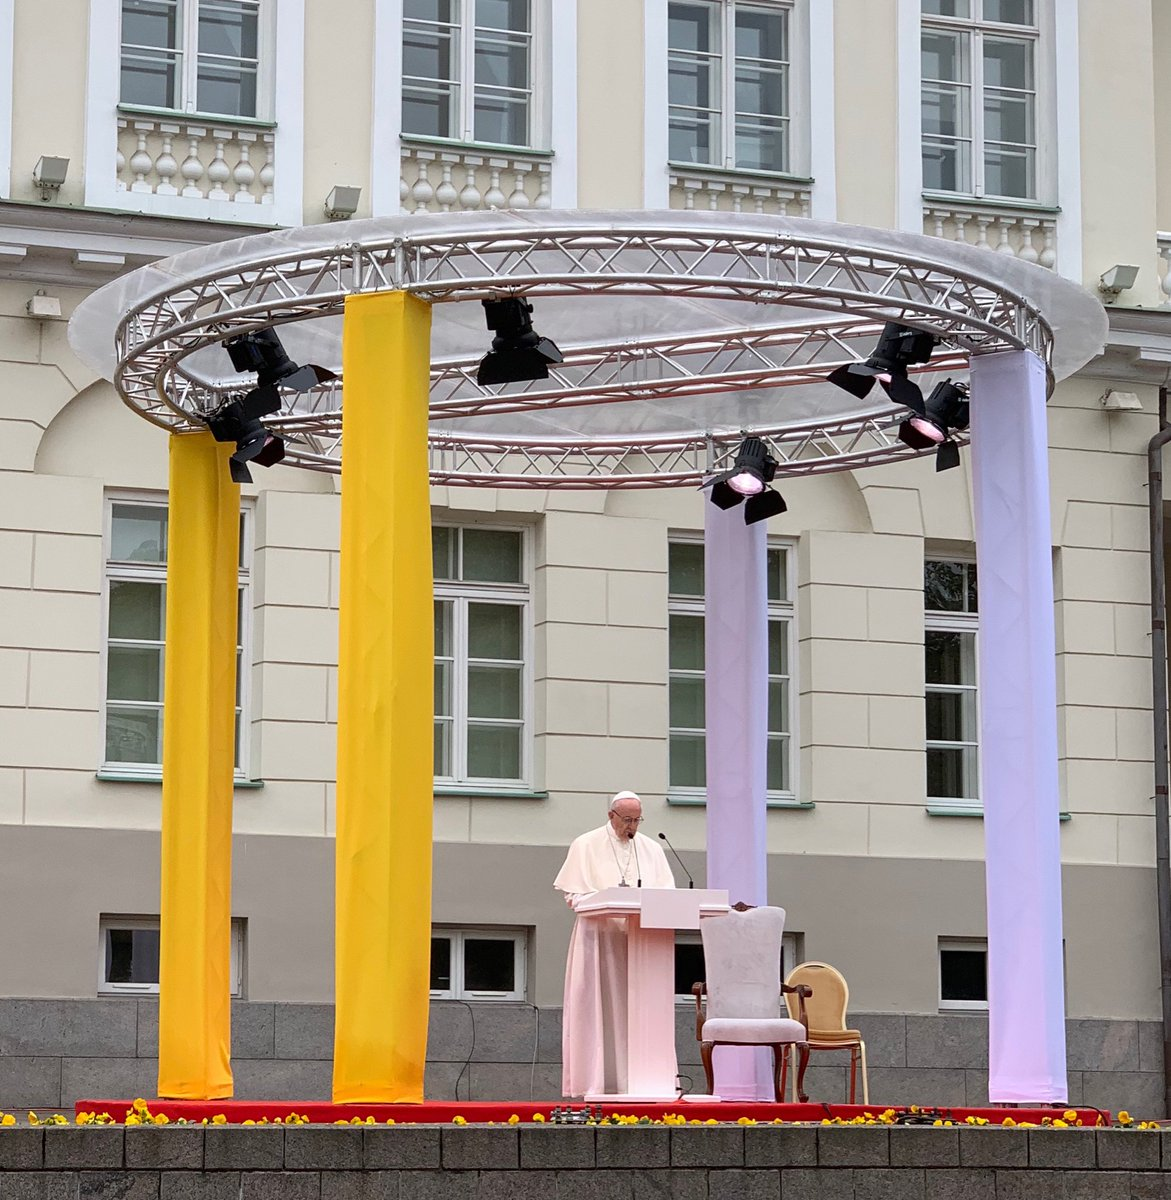 #PopeInBaltics